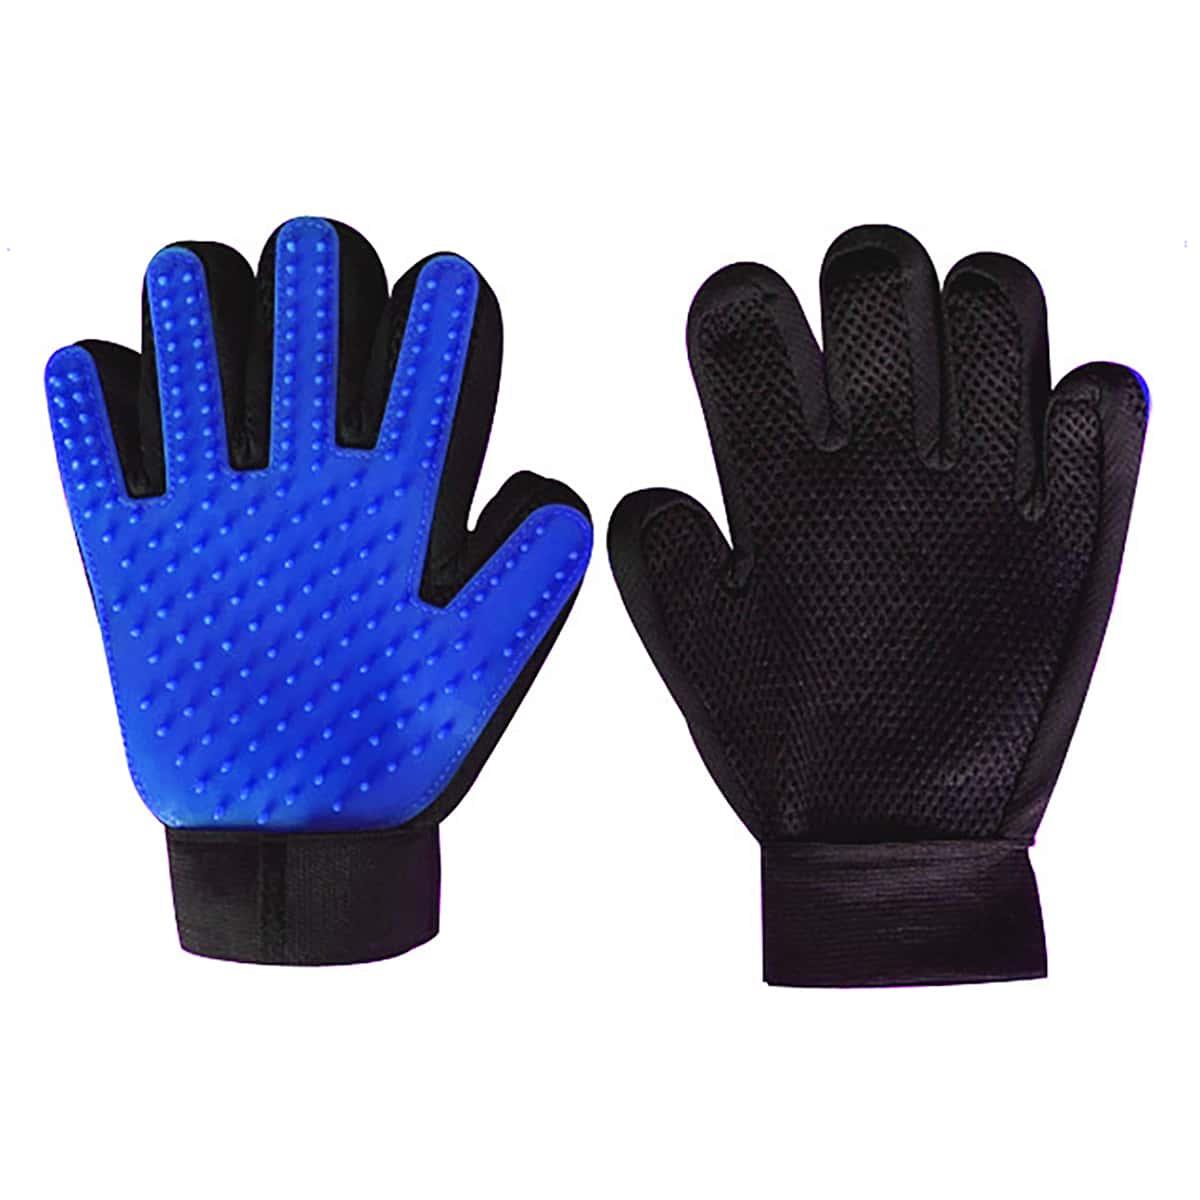 Массажная перчатка для груминга собак 1шт